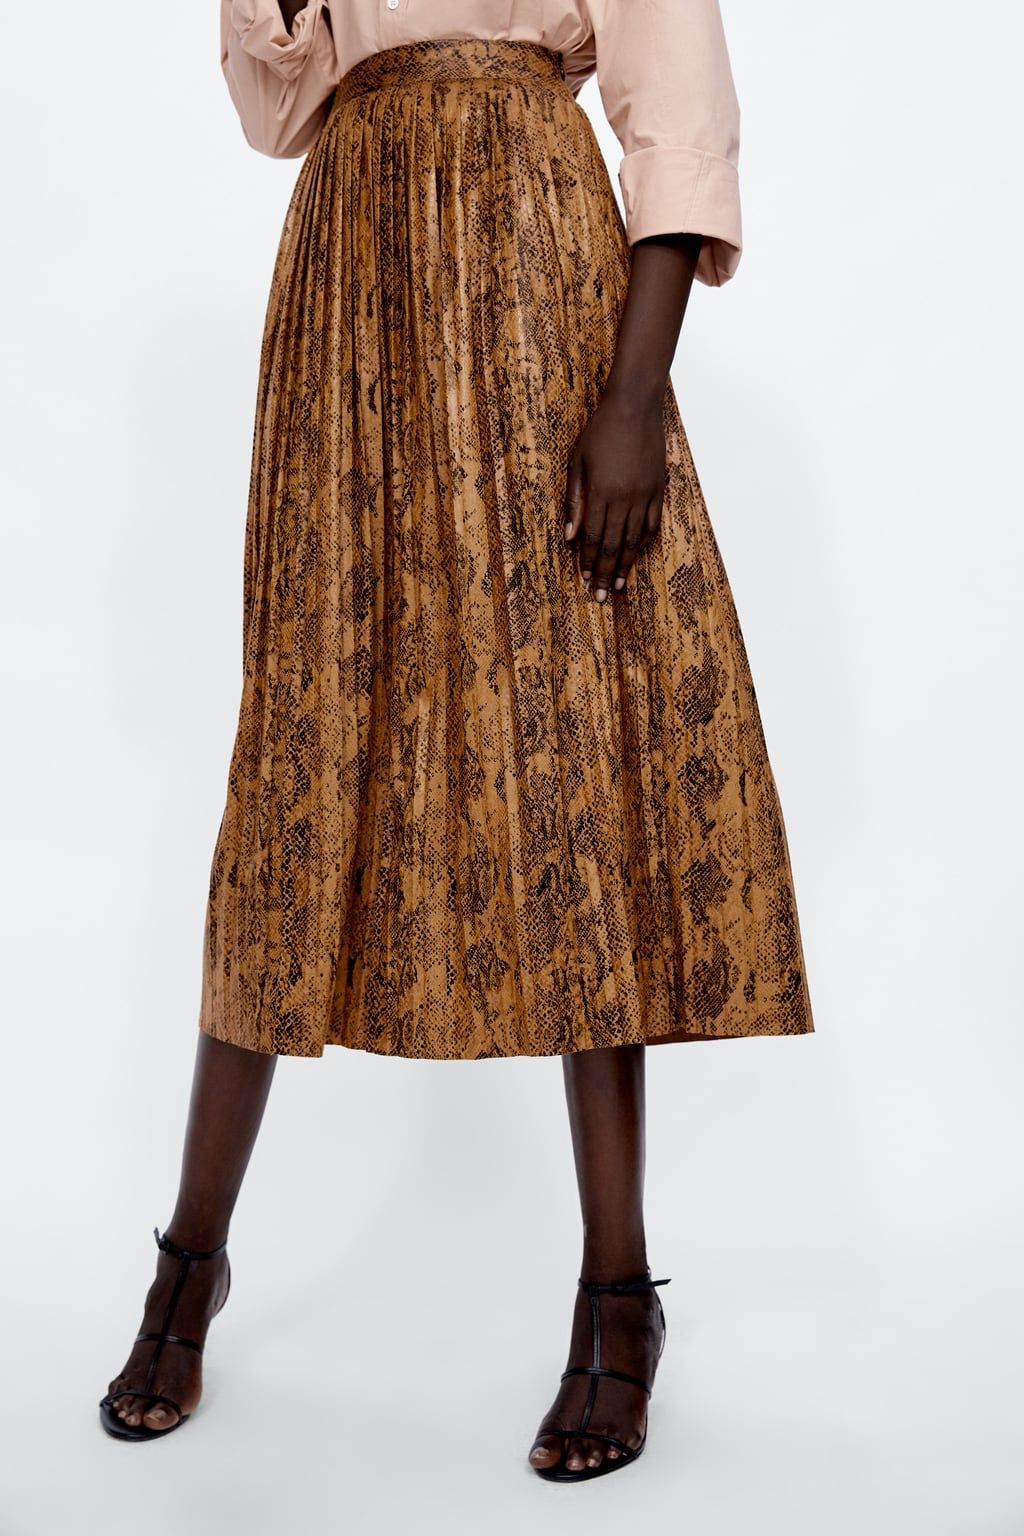 9b51f326a9f5 Image 1 of SNAKESKIN PRINT PLEATED MIDI SKIRT from Zara School Dresses